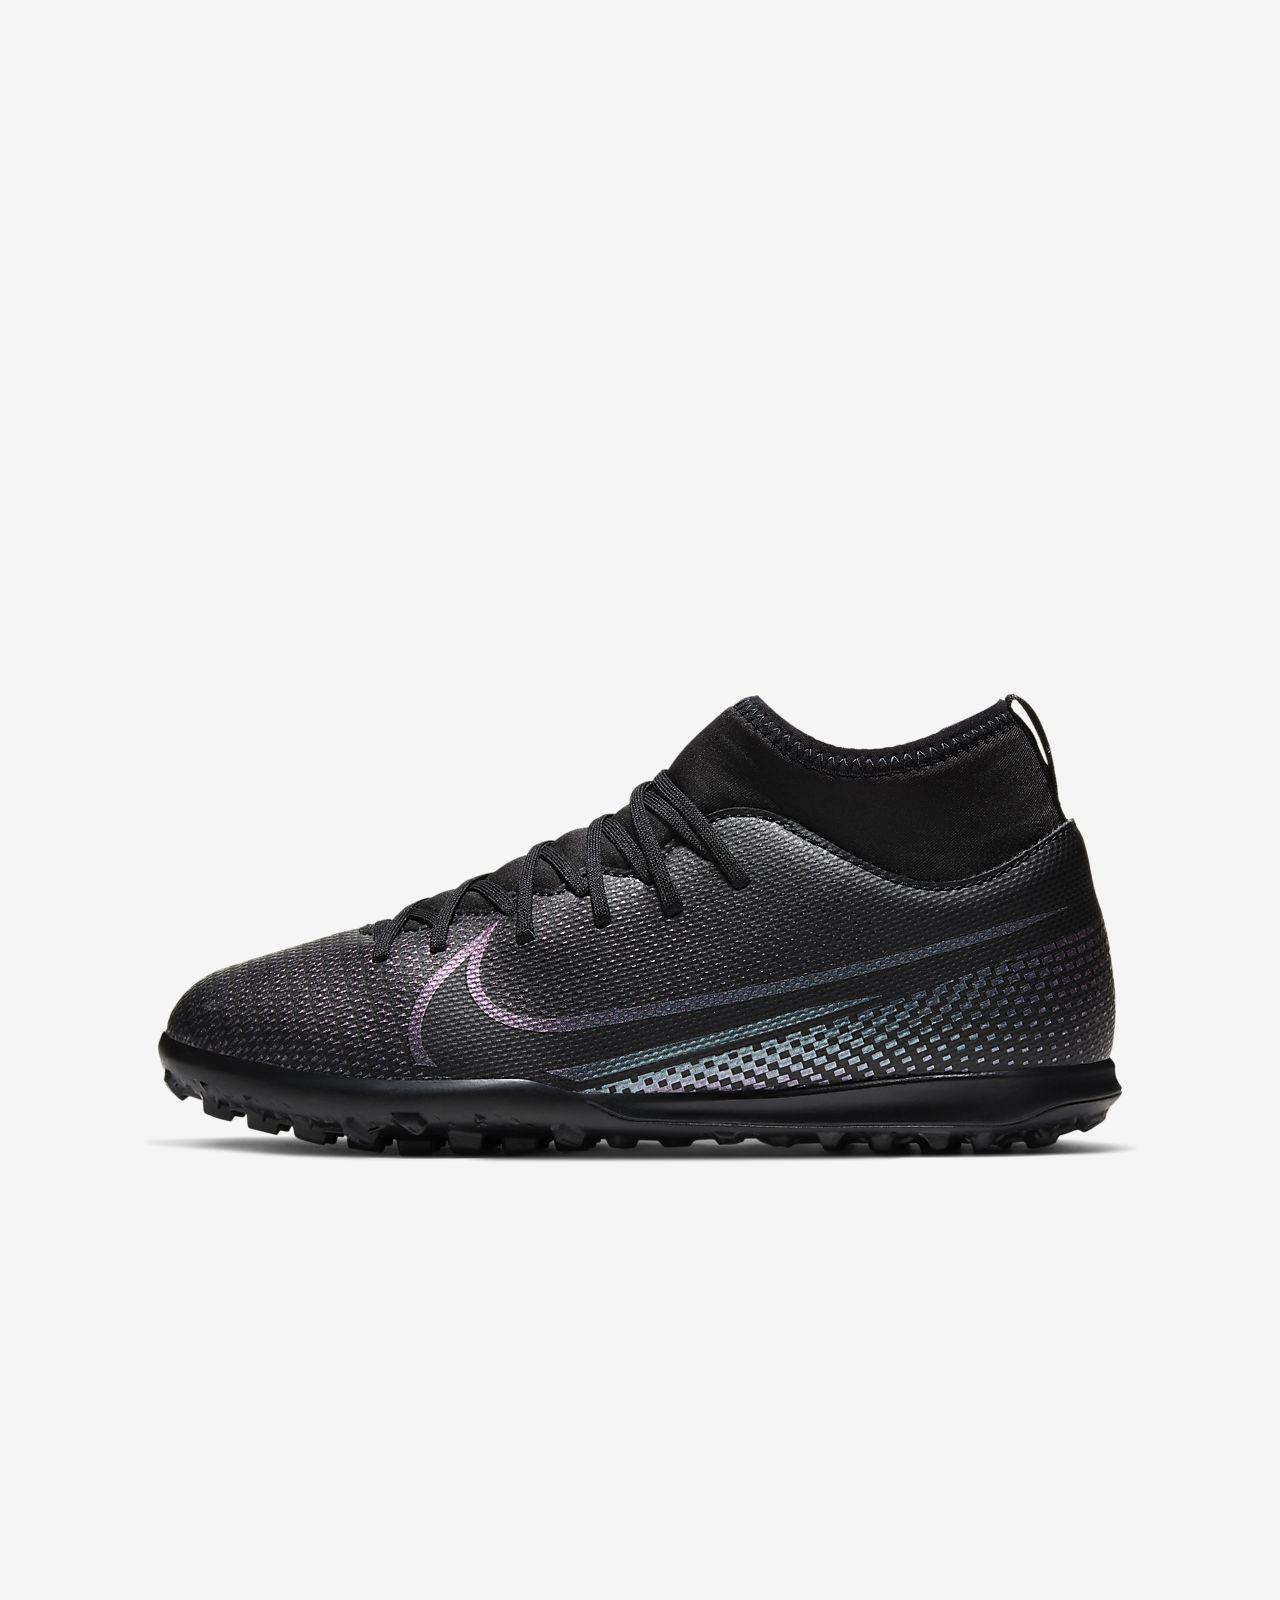 Nike Jr. Mercurial Superfly 7 Club TF Little/Big Kids' Artificial-Turf Soccer Shoe